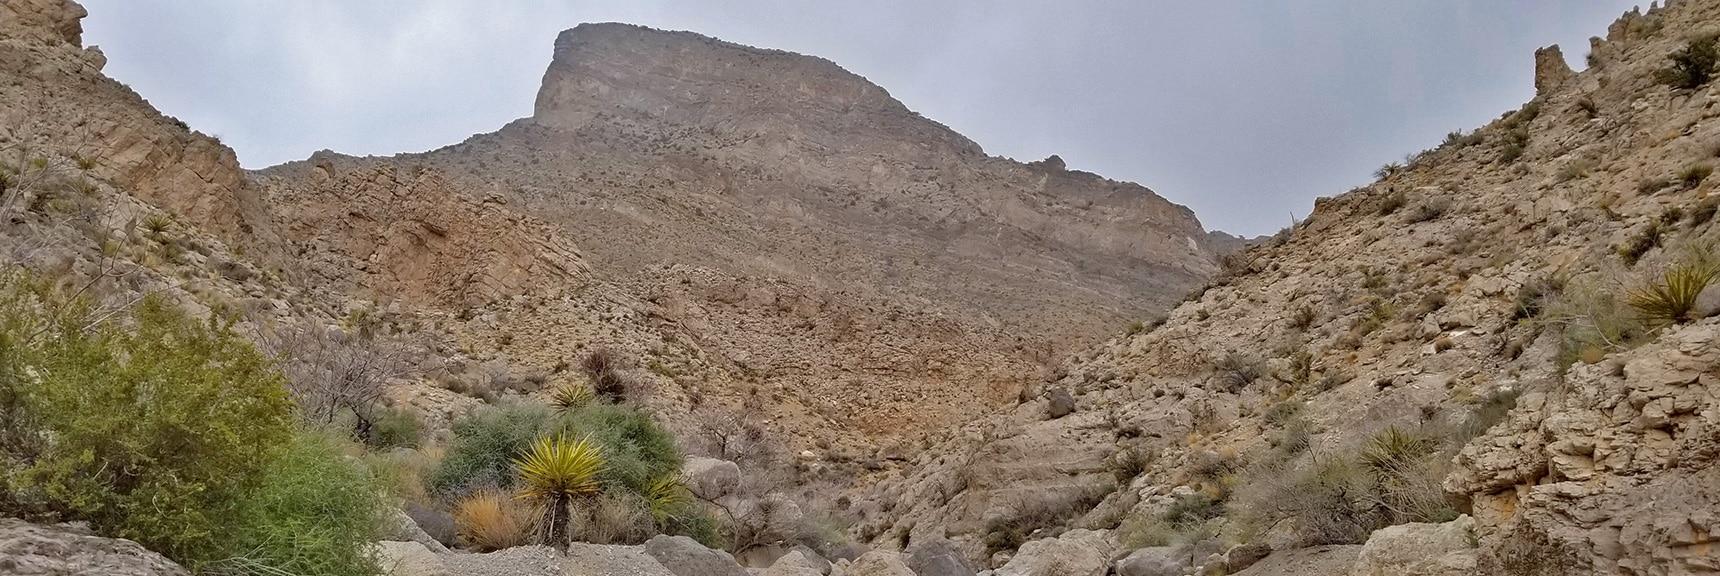 Turtlehead Peak from Rattlesnake Trail in gateway Canyon | Kraft Mountain Loop | Calico Basin, Nevada